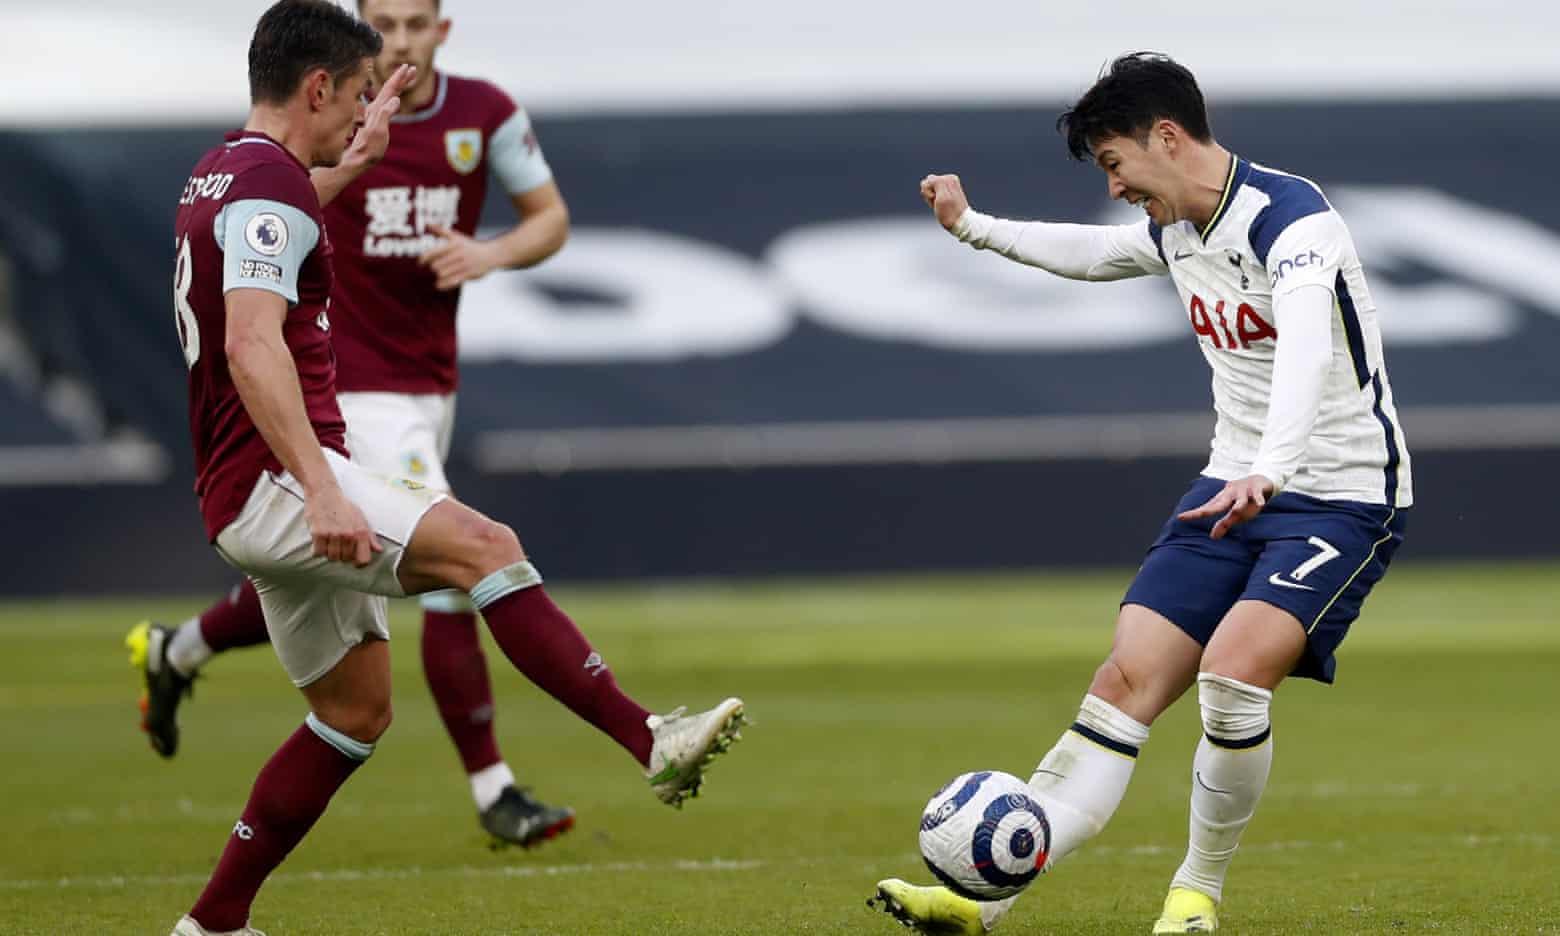 Son sendiri menciptakan tujuh peluang dalam game ini - rekornya sendiri di Tottenham, tetapi terbukti canggung dalam tembakan.  Foto: EPA